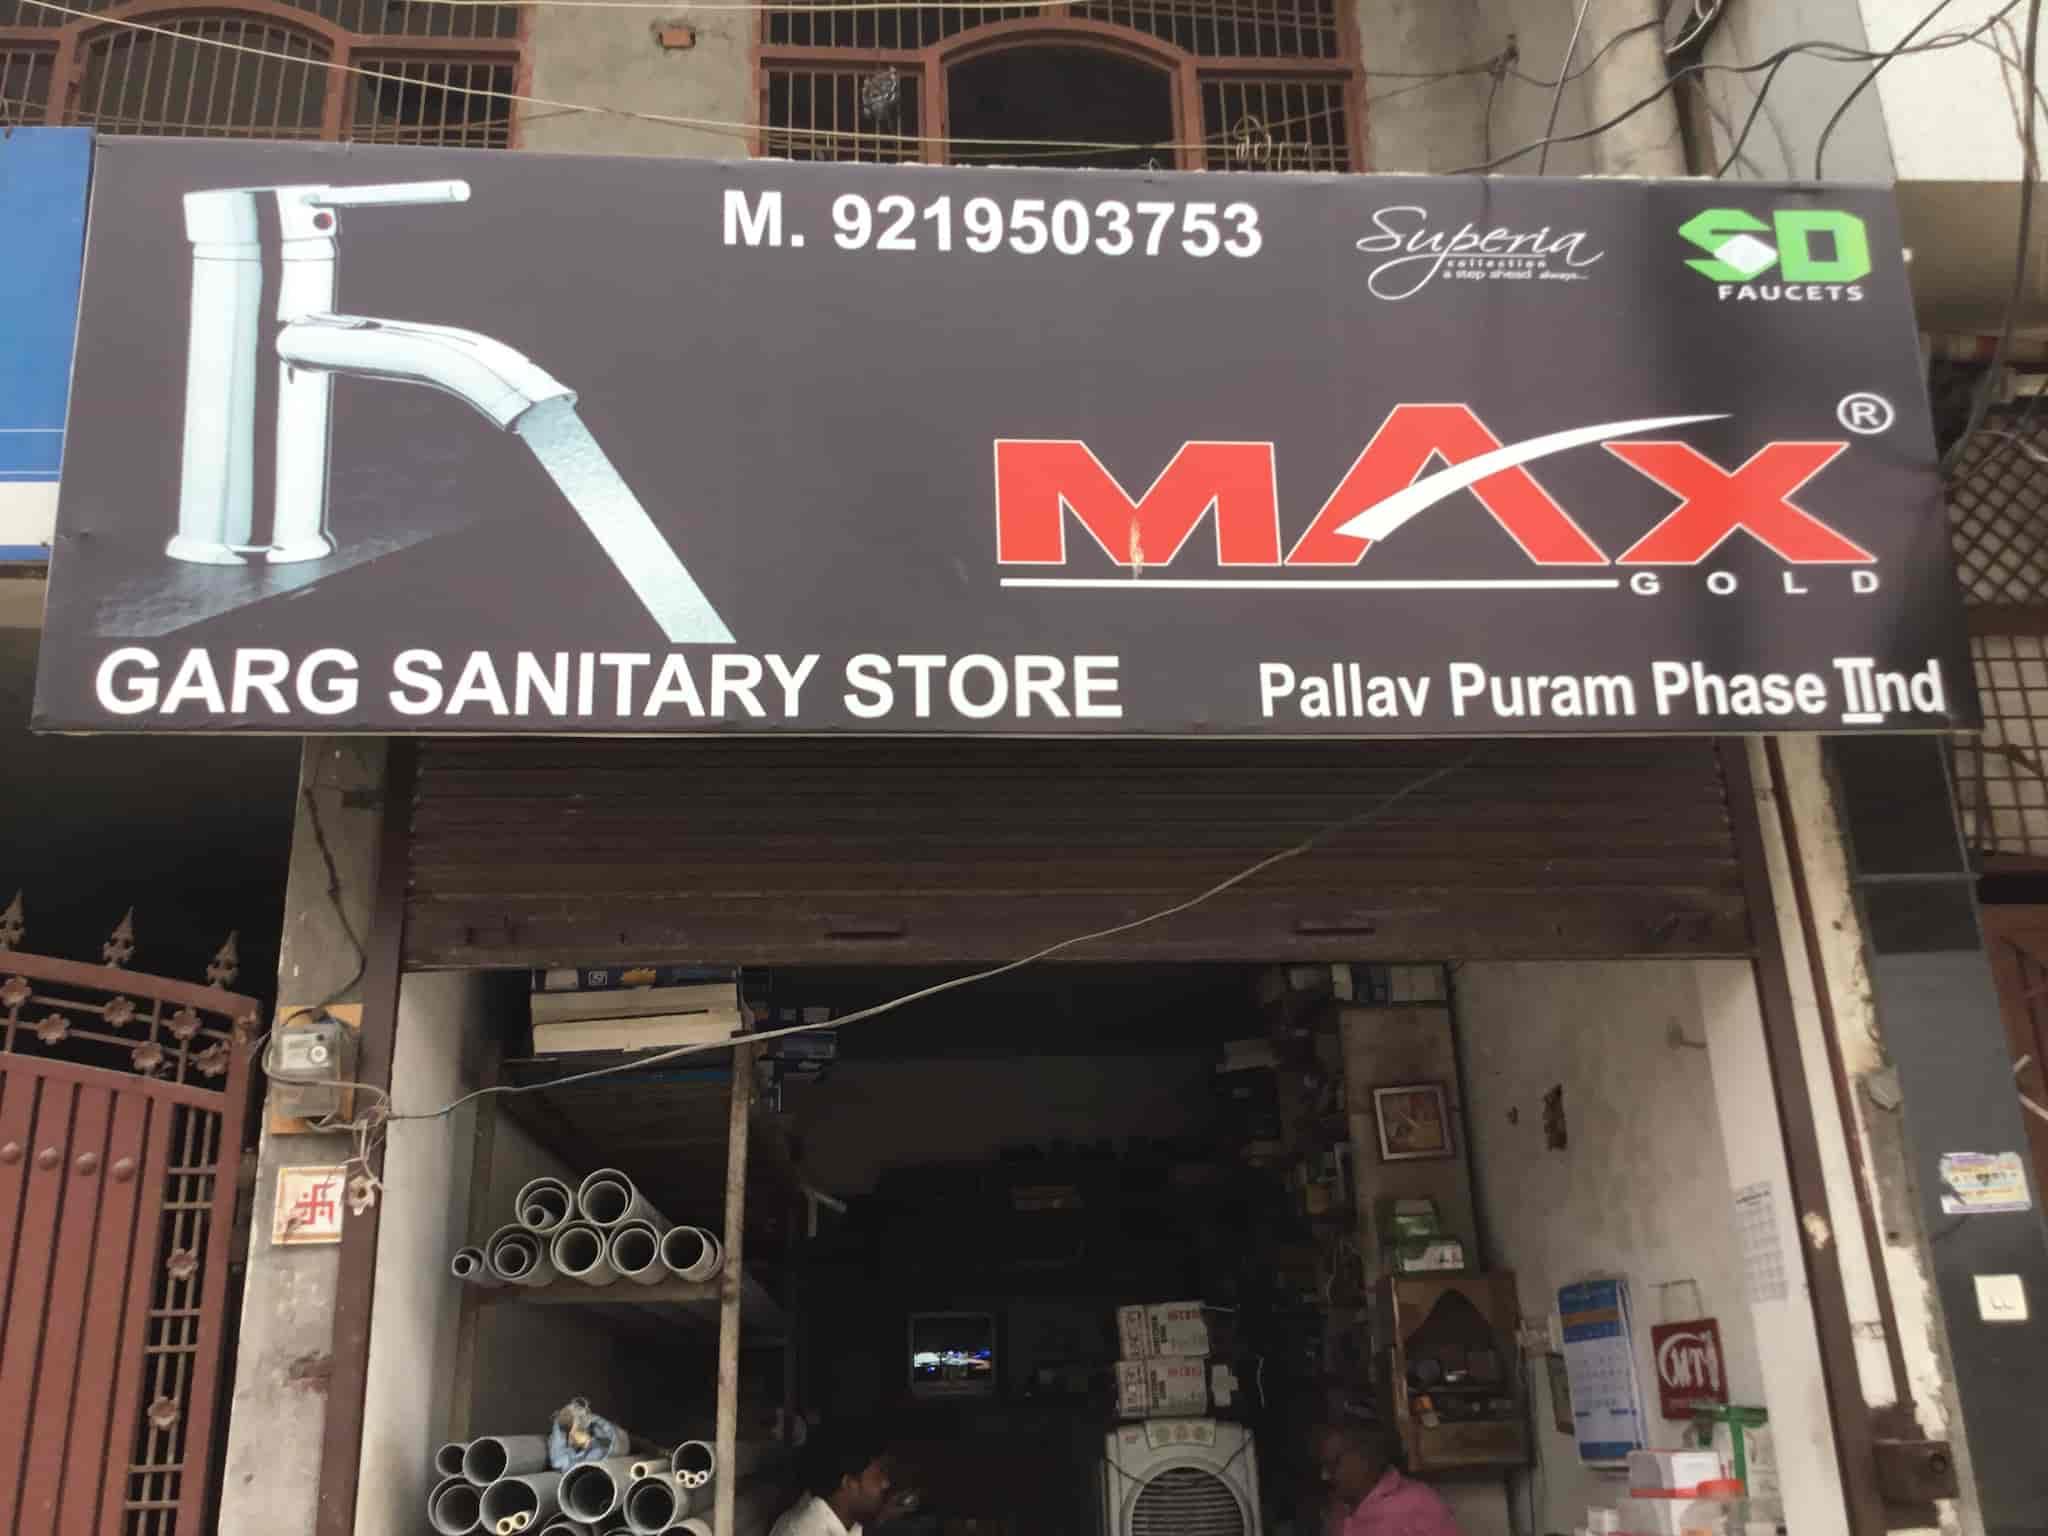 Garg Sanitary Store Photos, Pallav Puram Phase 2, Meerut- Pictures ...